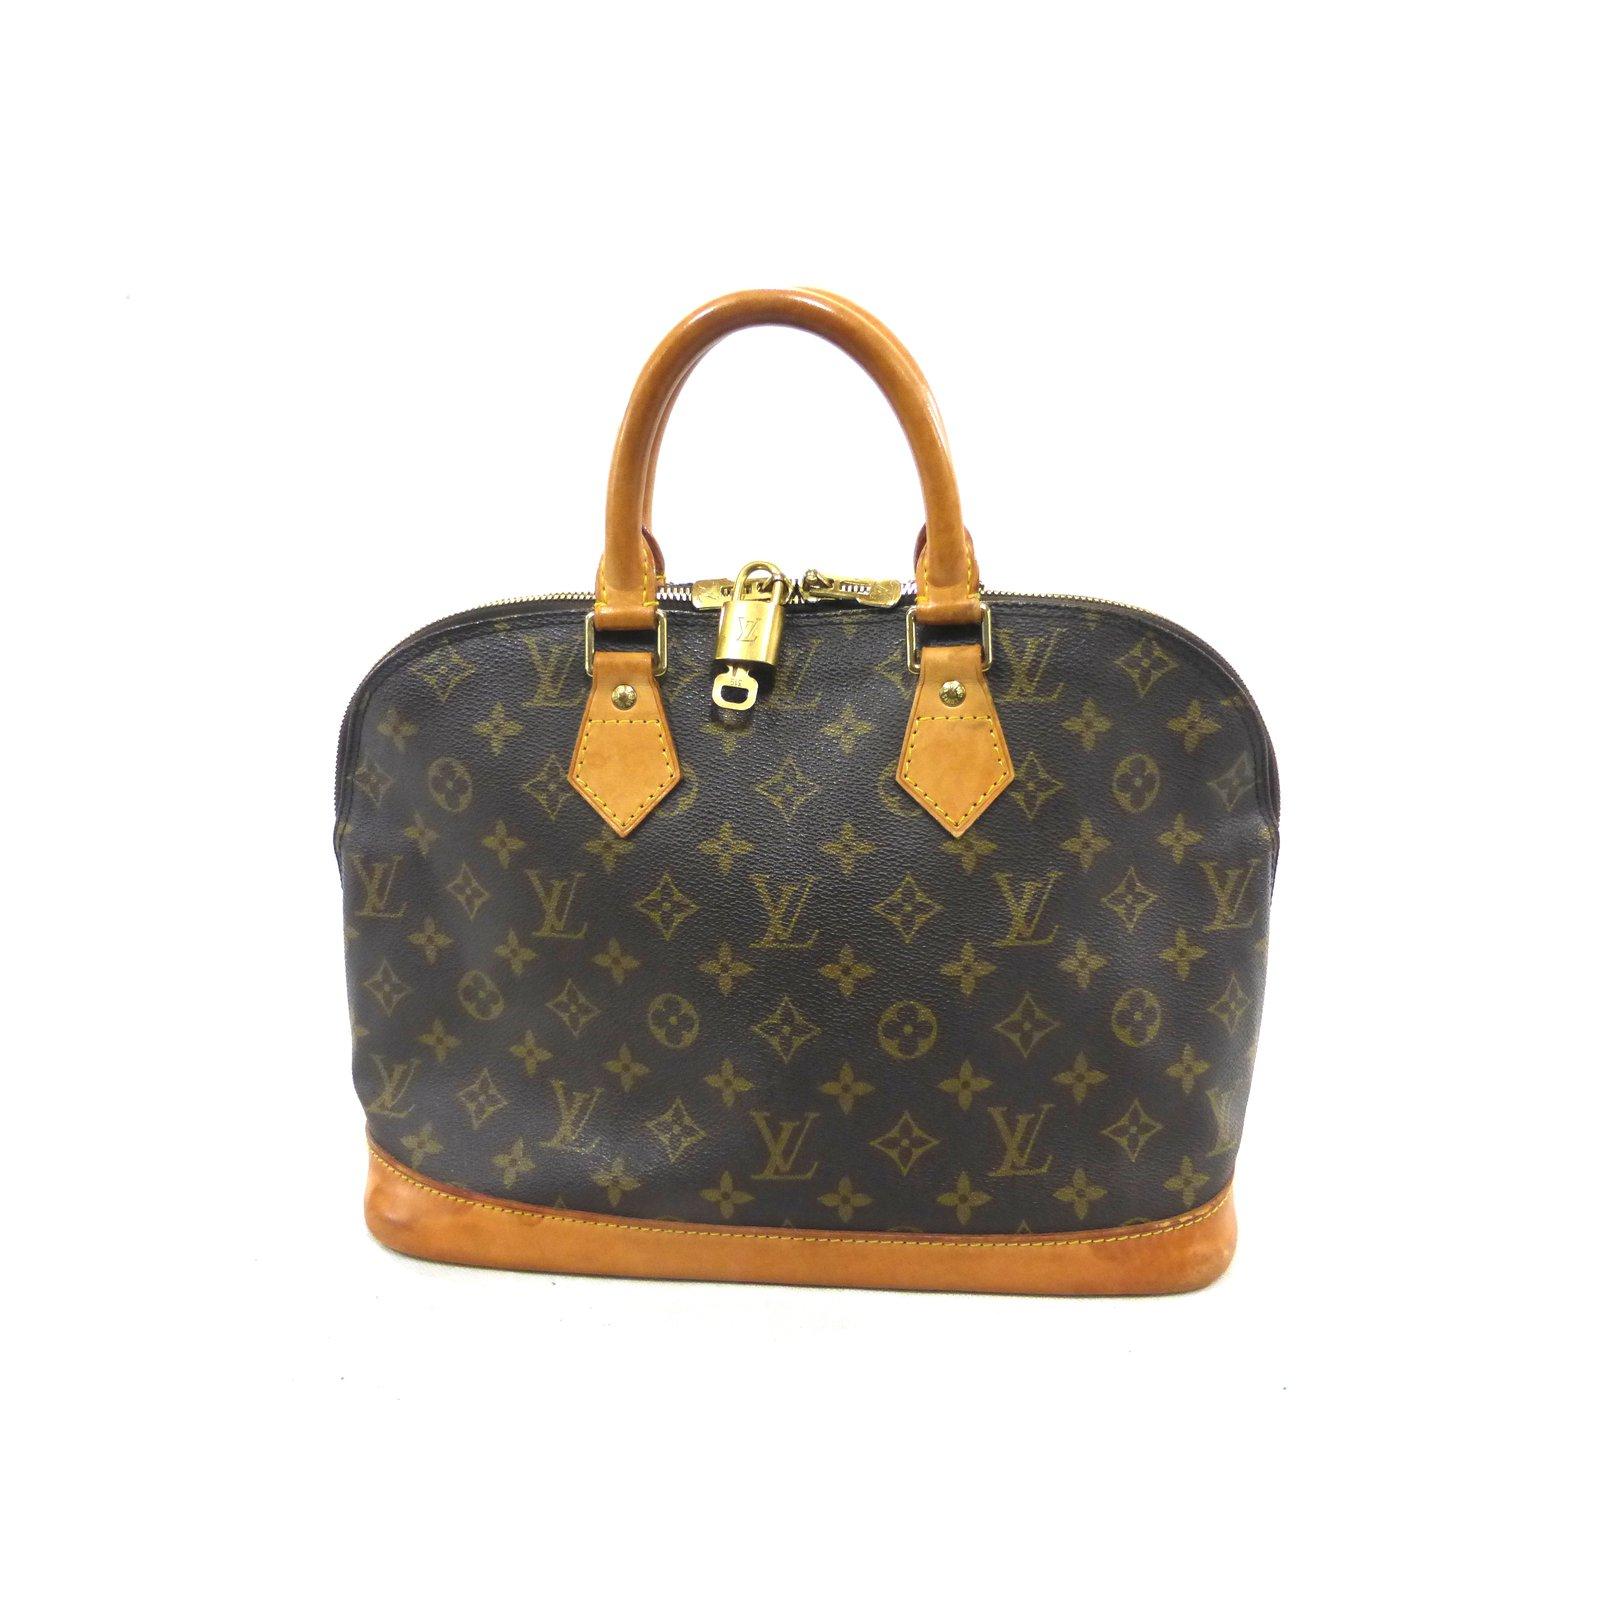 2071b5a0f4f1 Louis Vuitton ALMA MONOGRAM Handbags Leather Brown ref.99337 - Joli ...